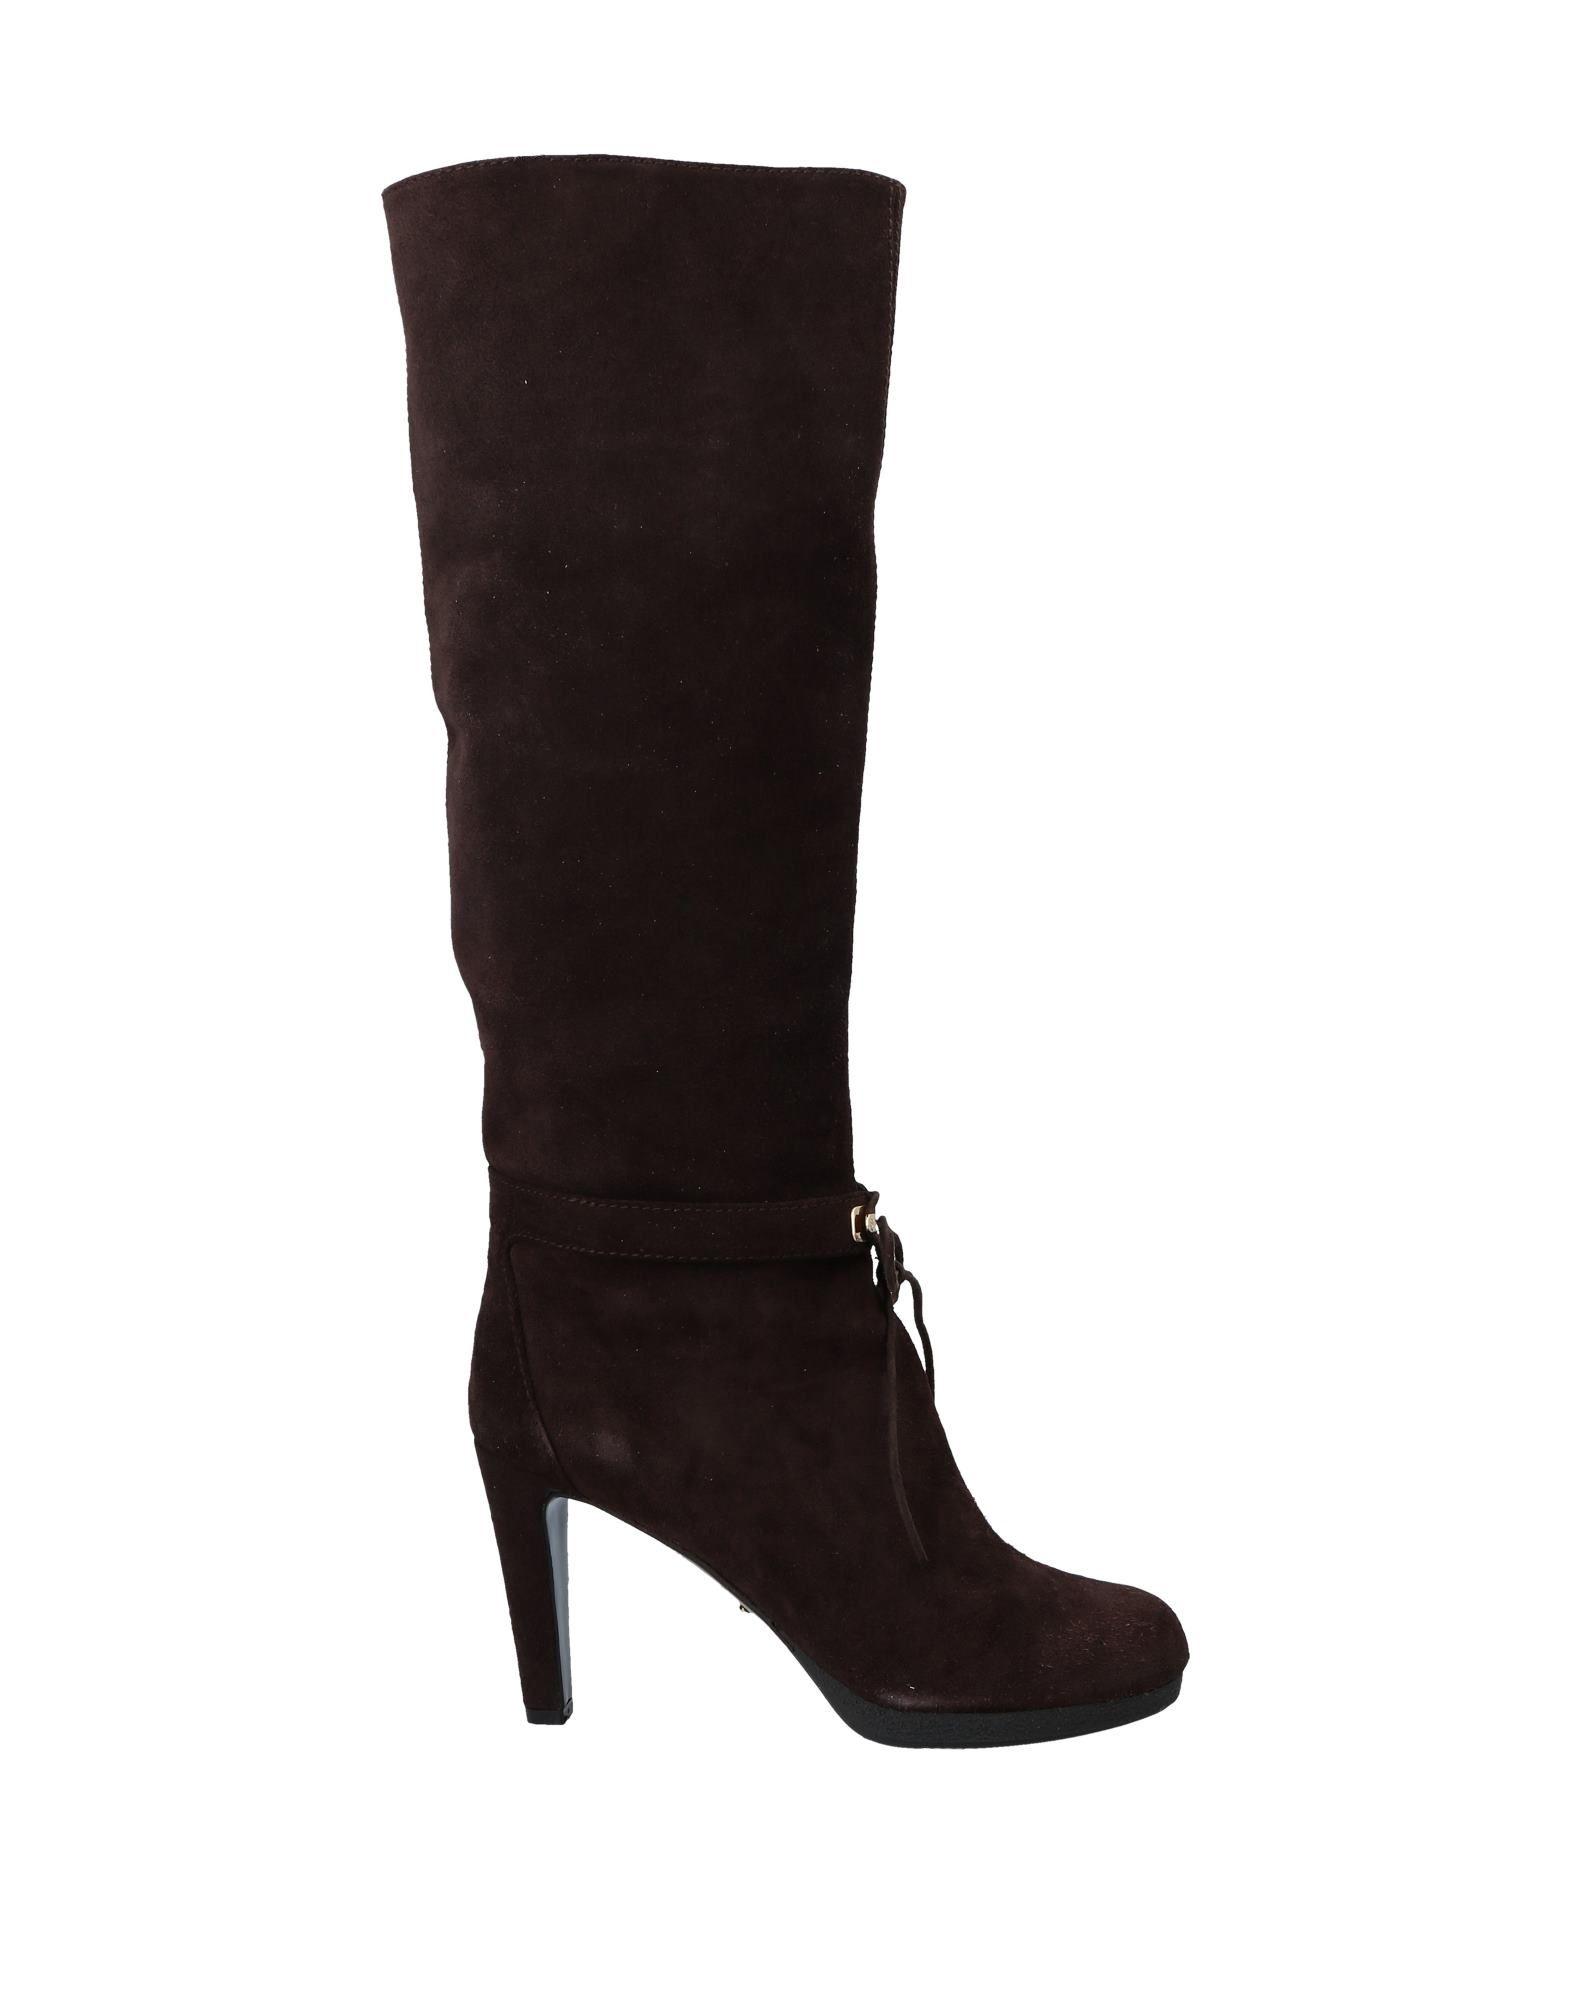 Sergio Sergio Rossi Boots - Women Sergio Sergio Rossi Boots online on  United Kingdom - 11546034QG 6bb68b